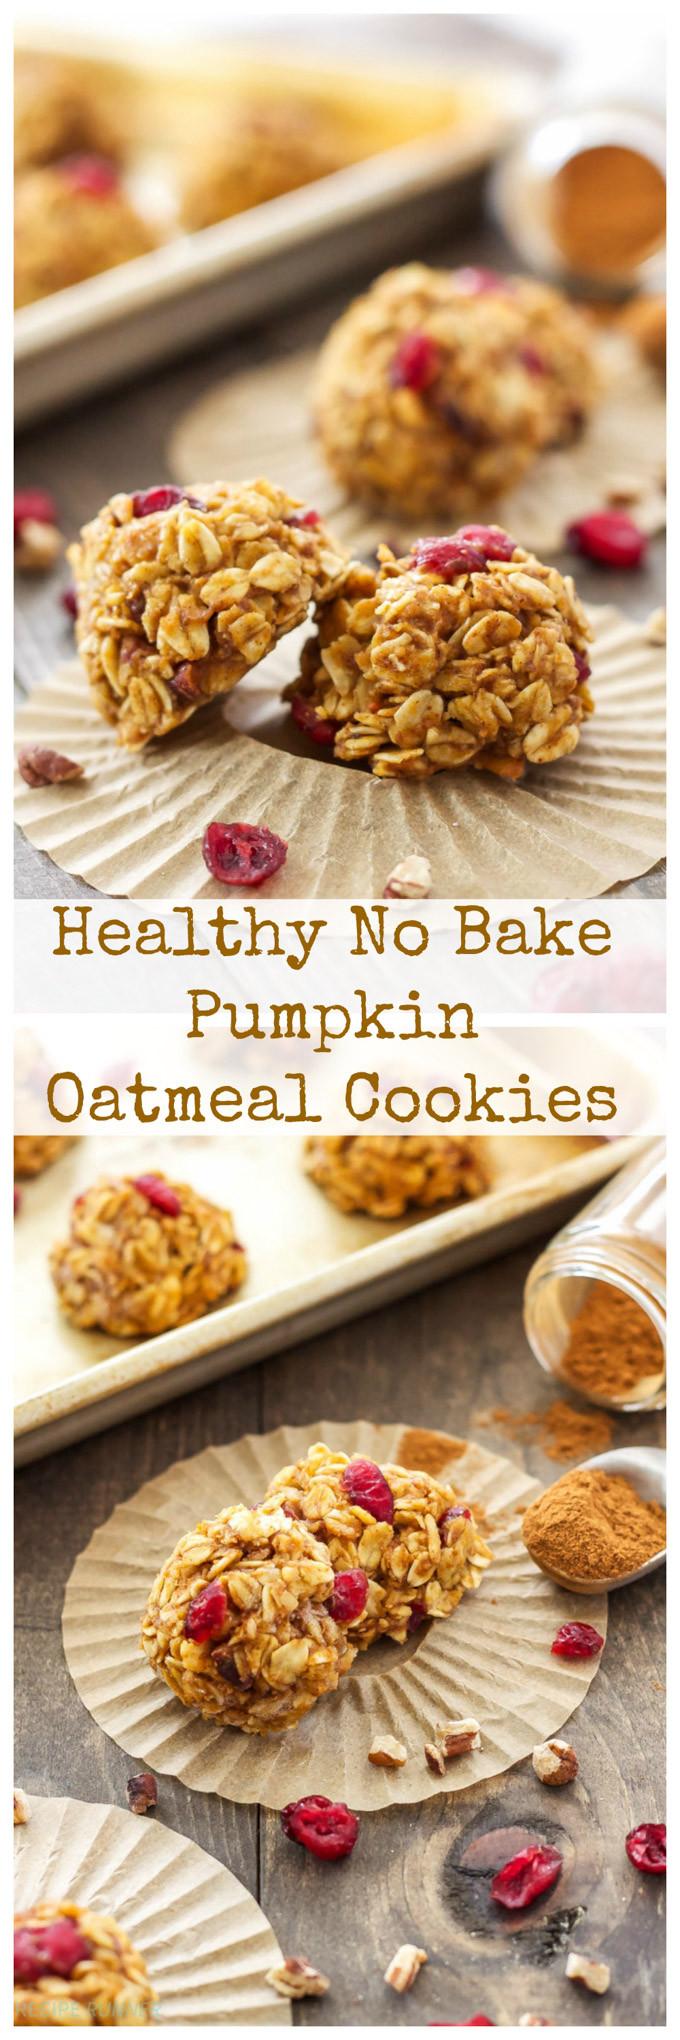 Healthy No Bake Oatmeal Cookies  Healthy No Bake Pumpkin Cookies Recipe Runner